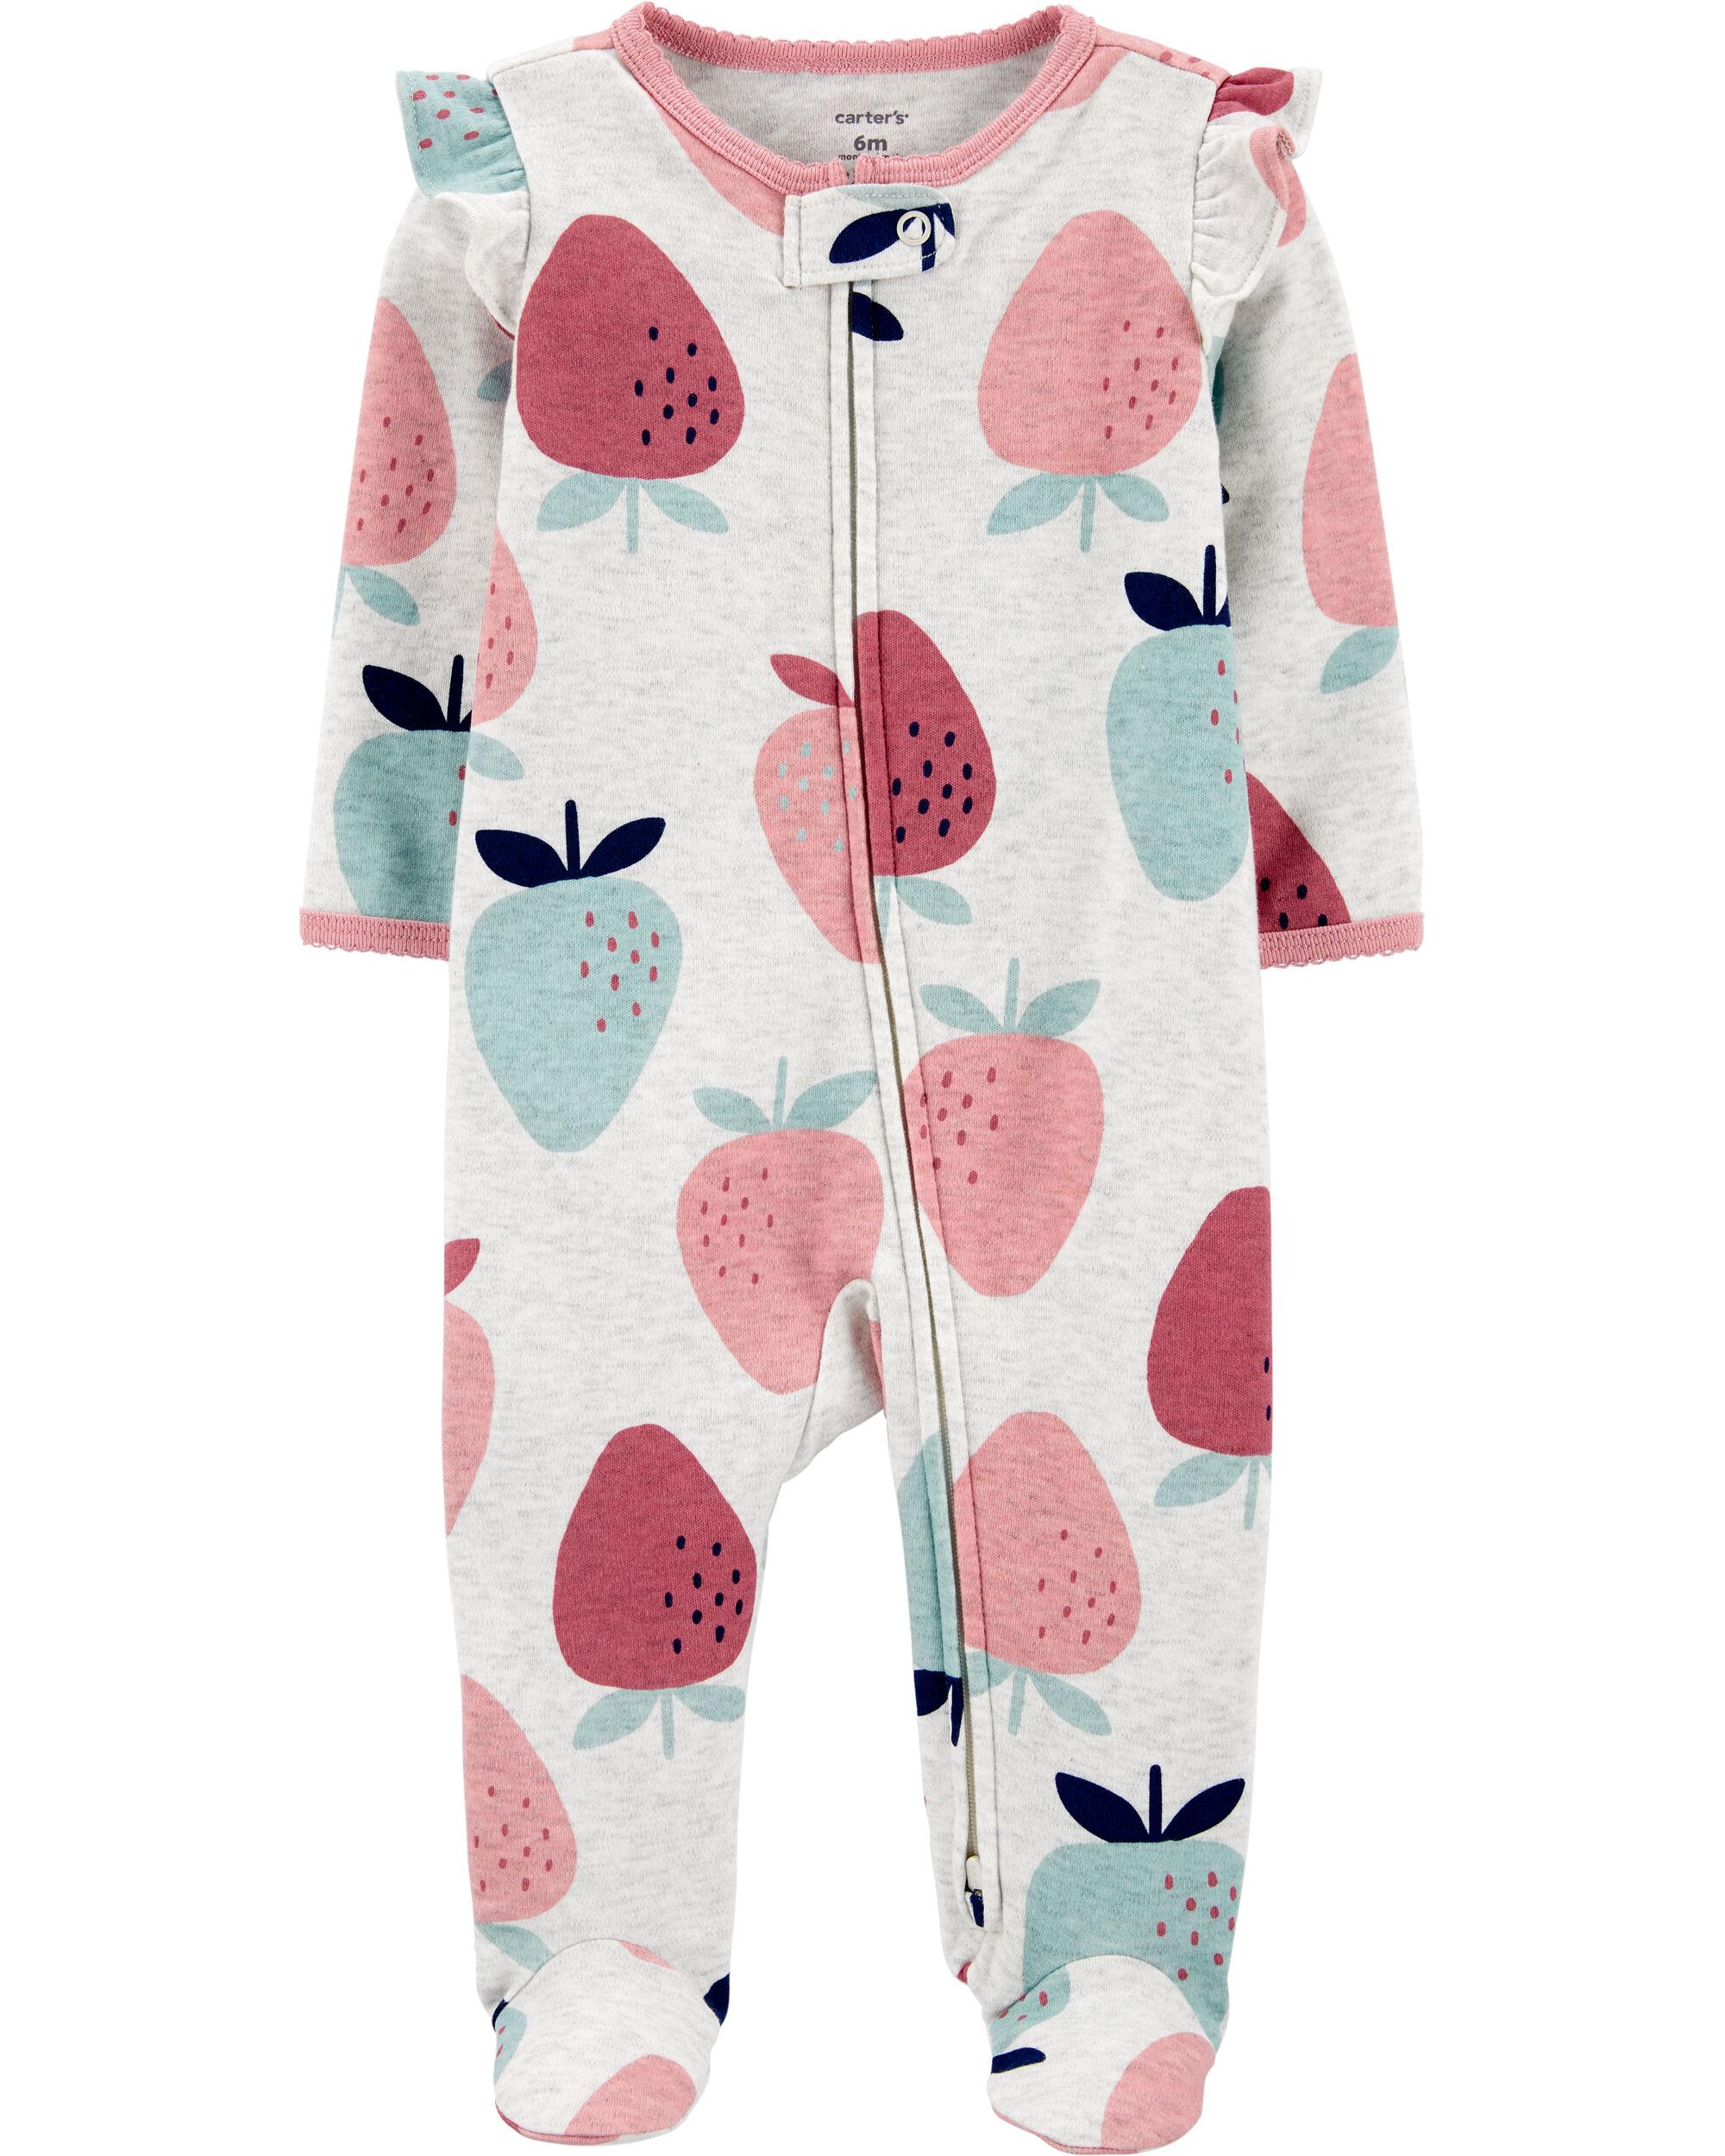 Strawberry 2-Way Zip Cotton Sleep & Play